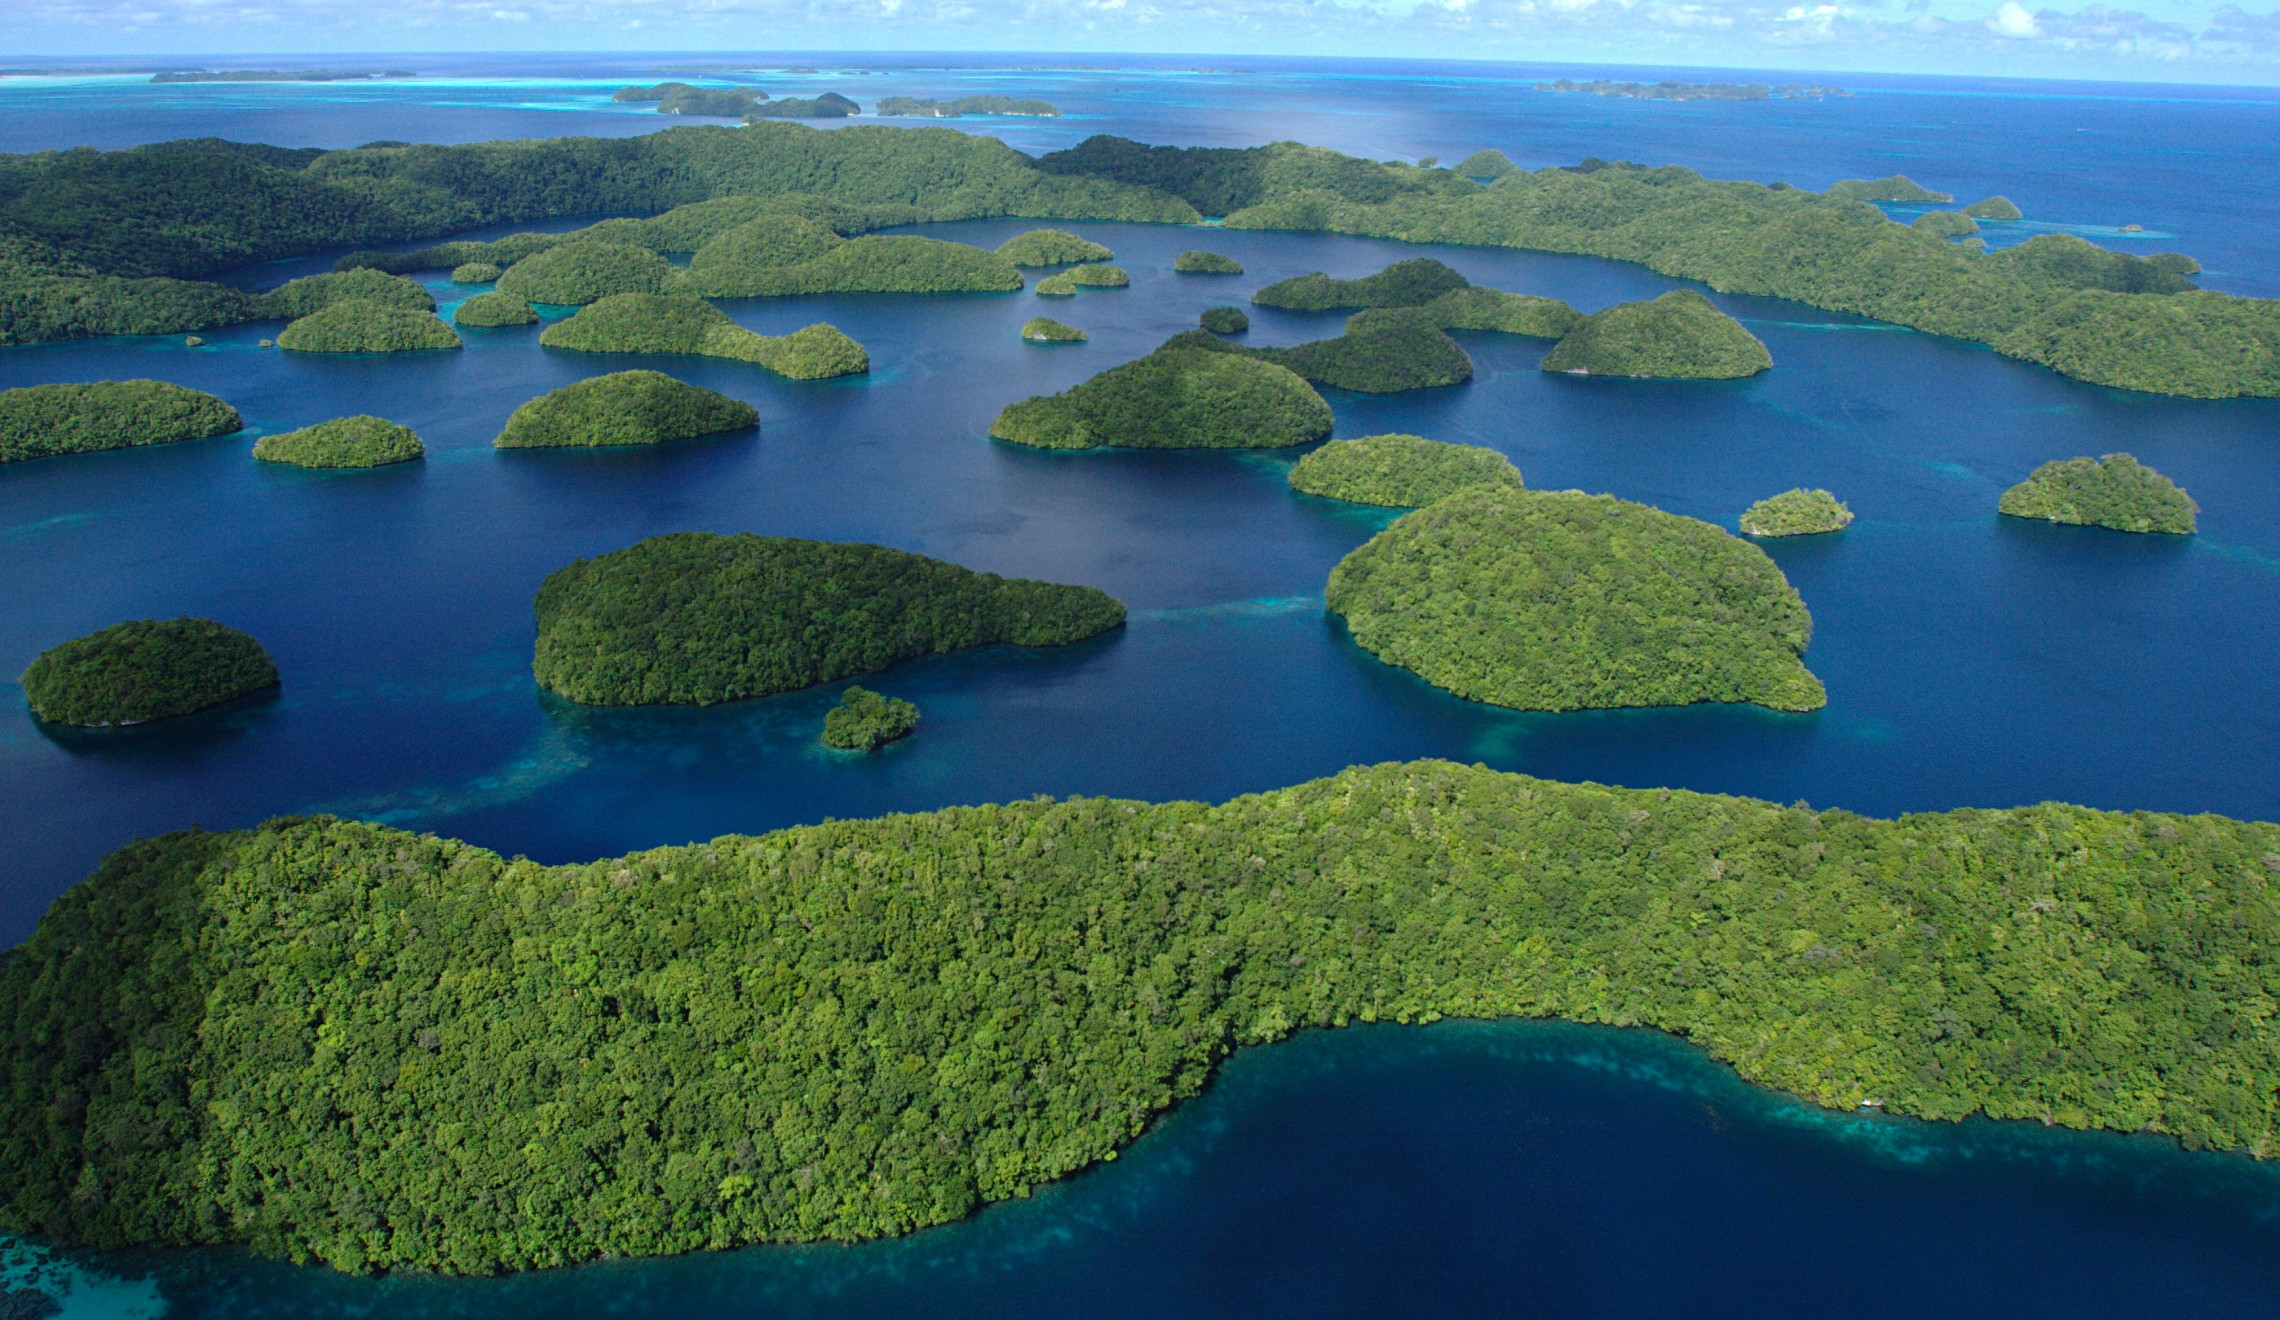 Palau_archipelago